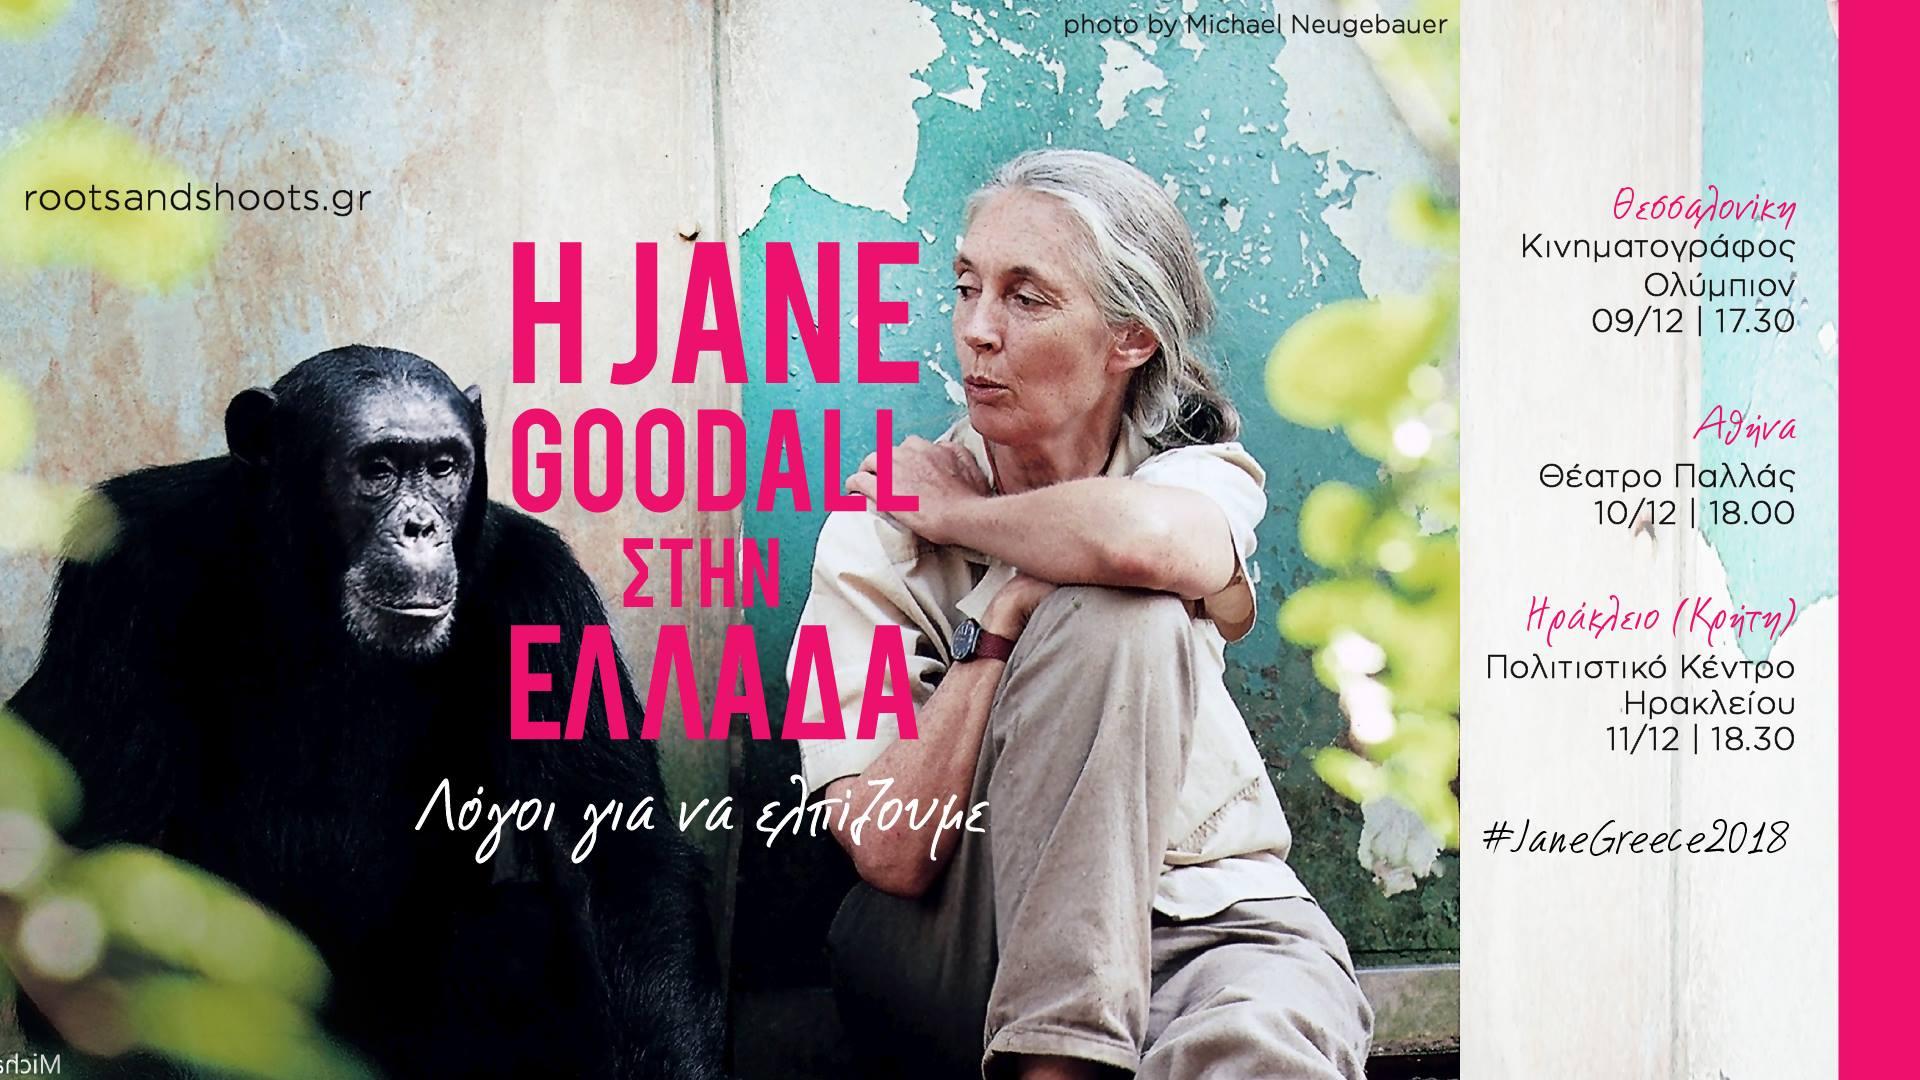 Dr Jane Goodall στο Ηρακλειο Κρητης! «δεν μπορείς να μοιραστείς τη ζωή σου με ένα ζώο αν δεν αντιληφθείς ότι και αυτά έχουν συναισθήματα»